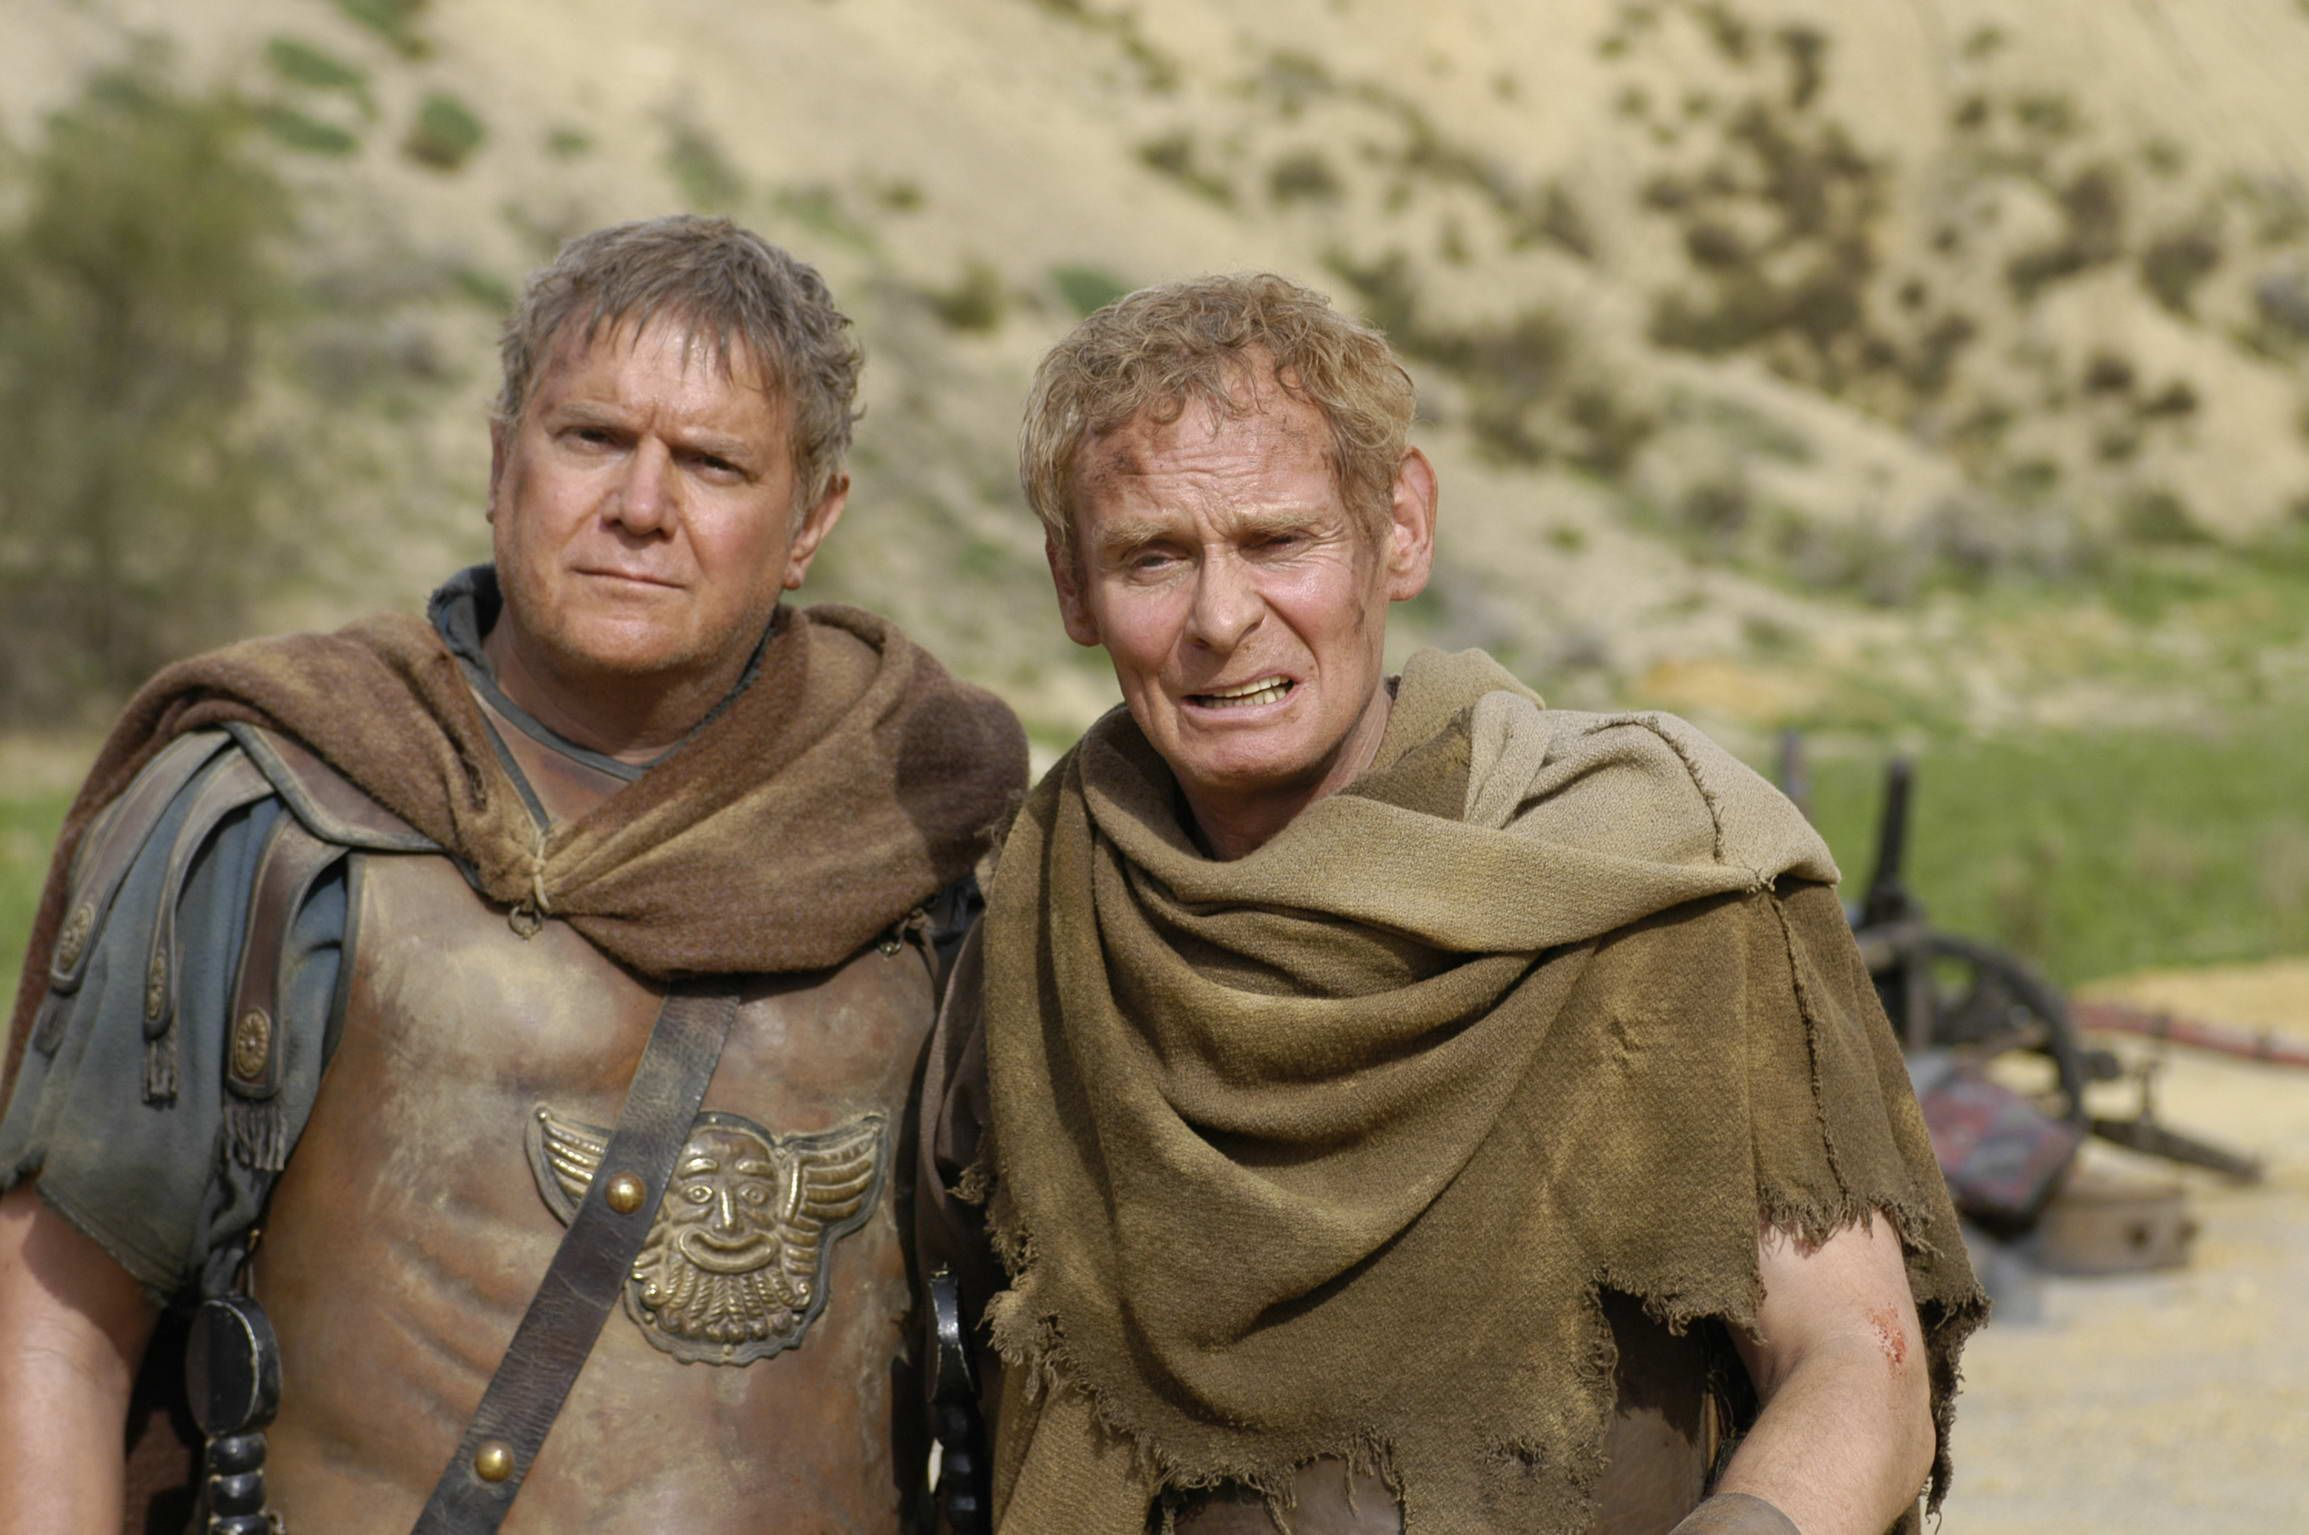 Rome TV Series - Season 1 Episode 9 Still | Rome tv series ...